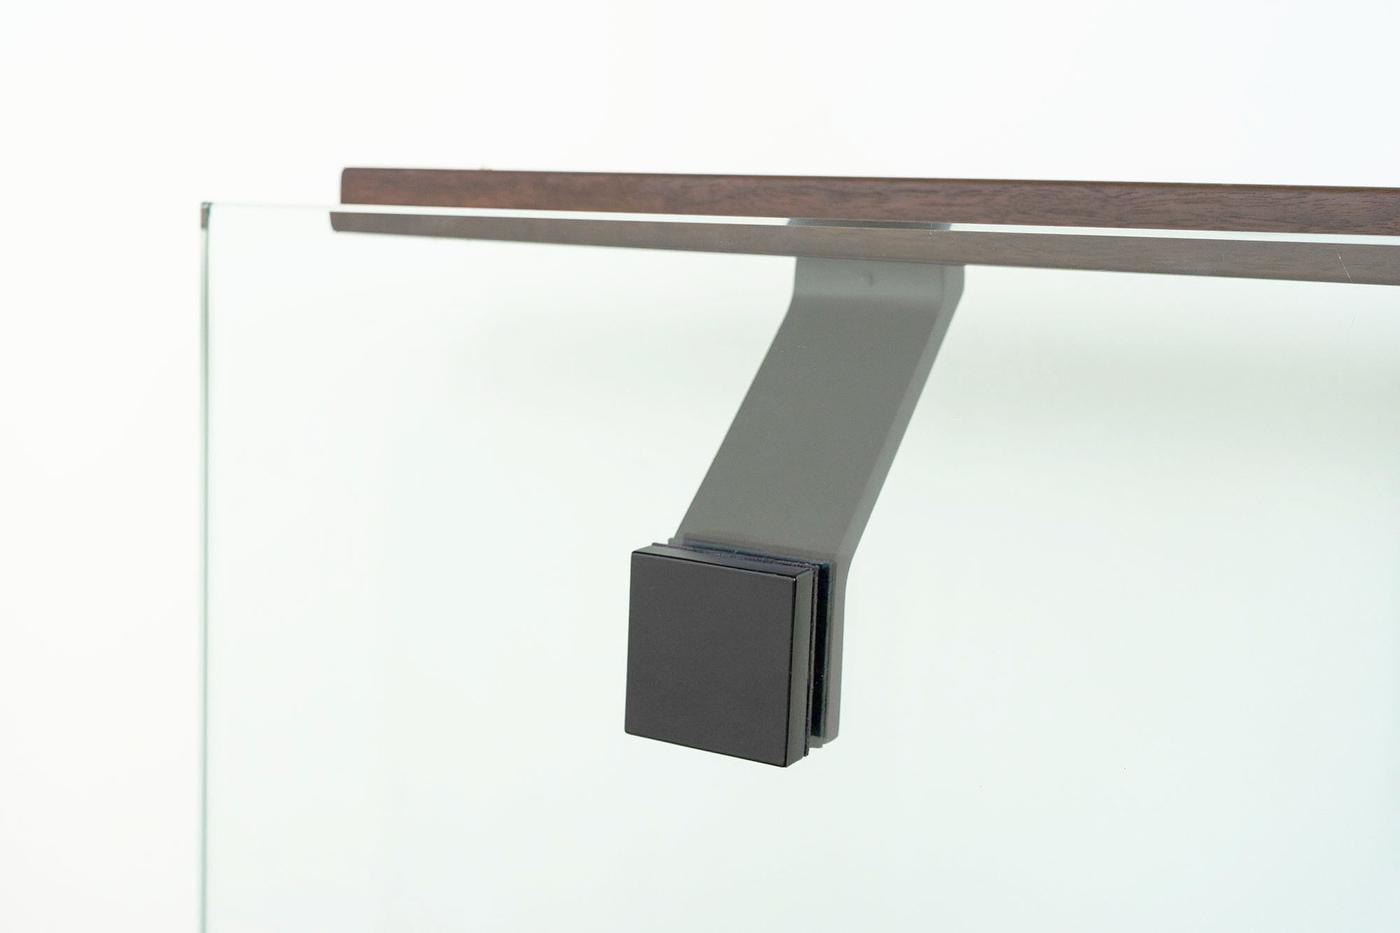 Glass-mounted-handrail-bracket